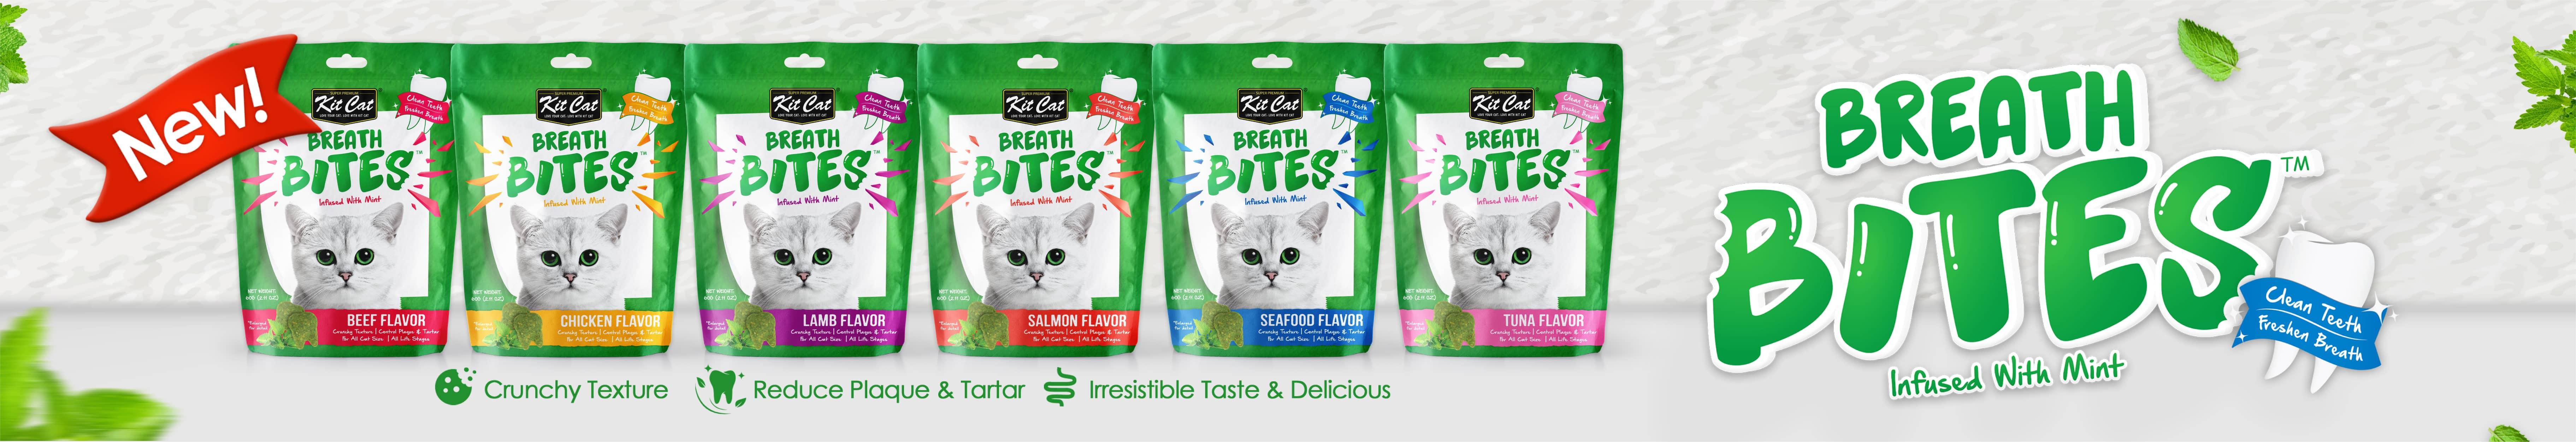 Kit Cat Breath Bites